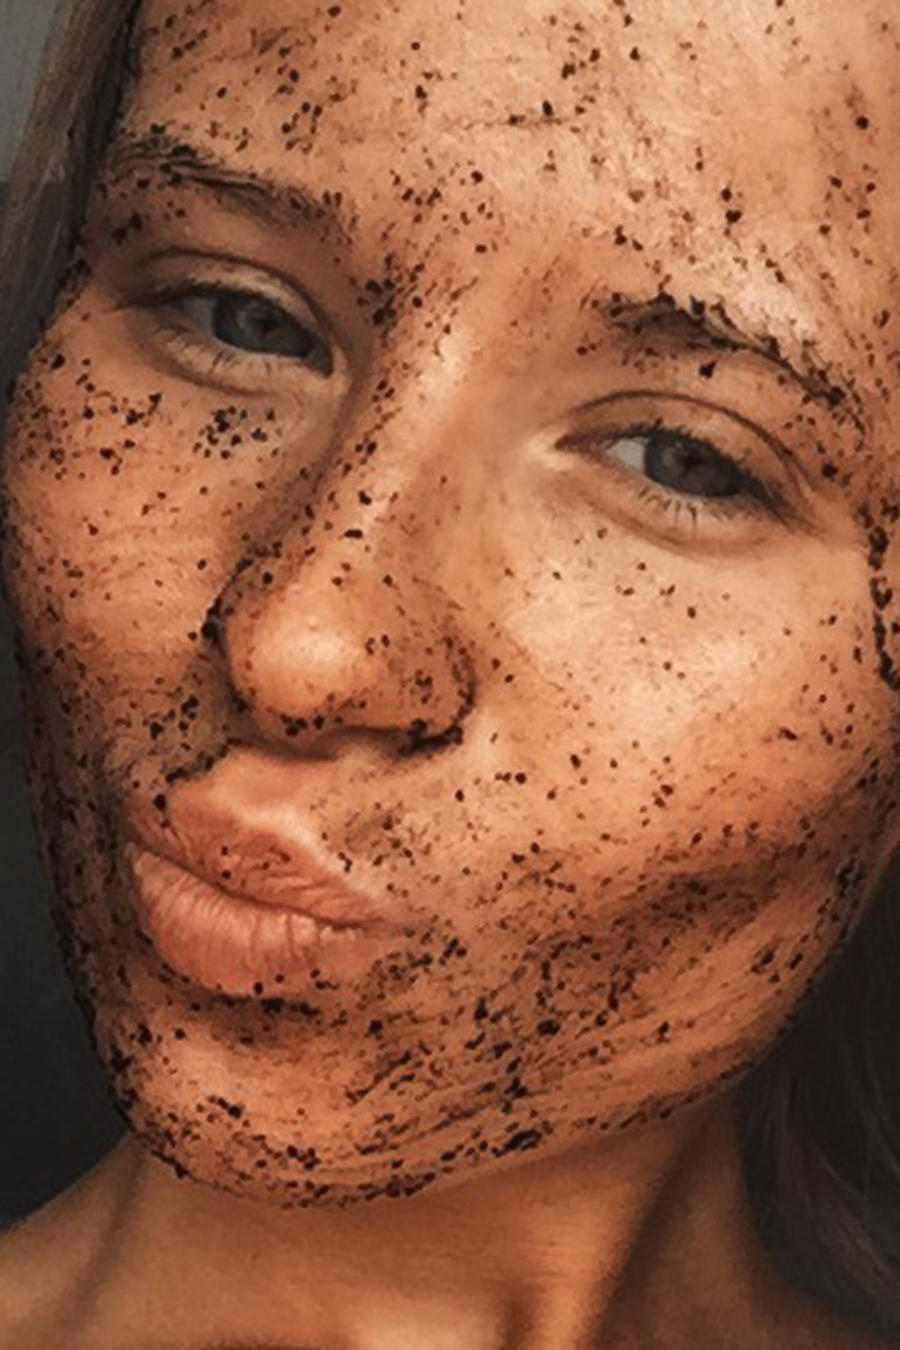 Mujer usando una mascarilla